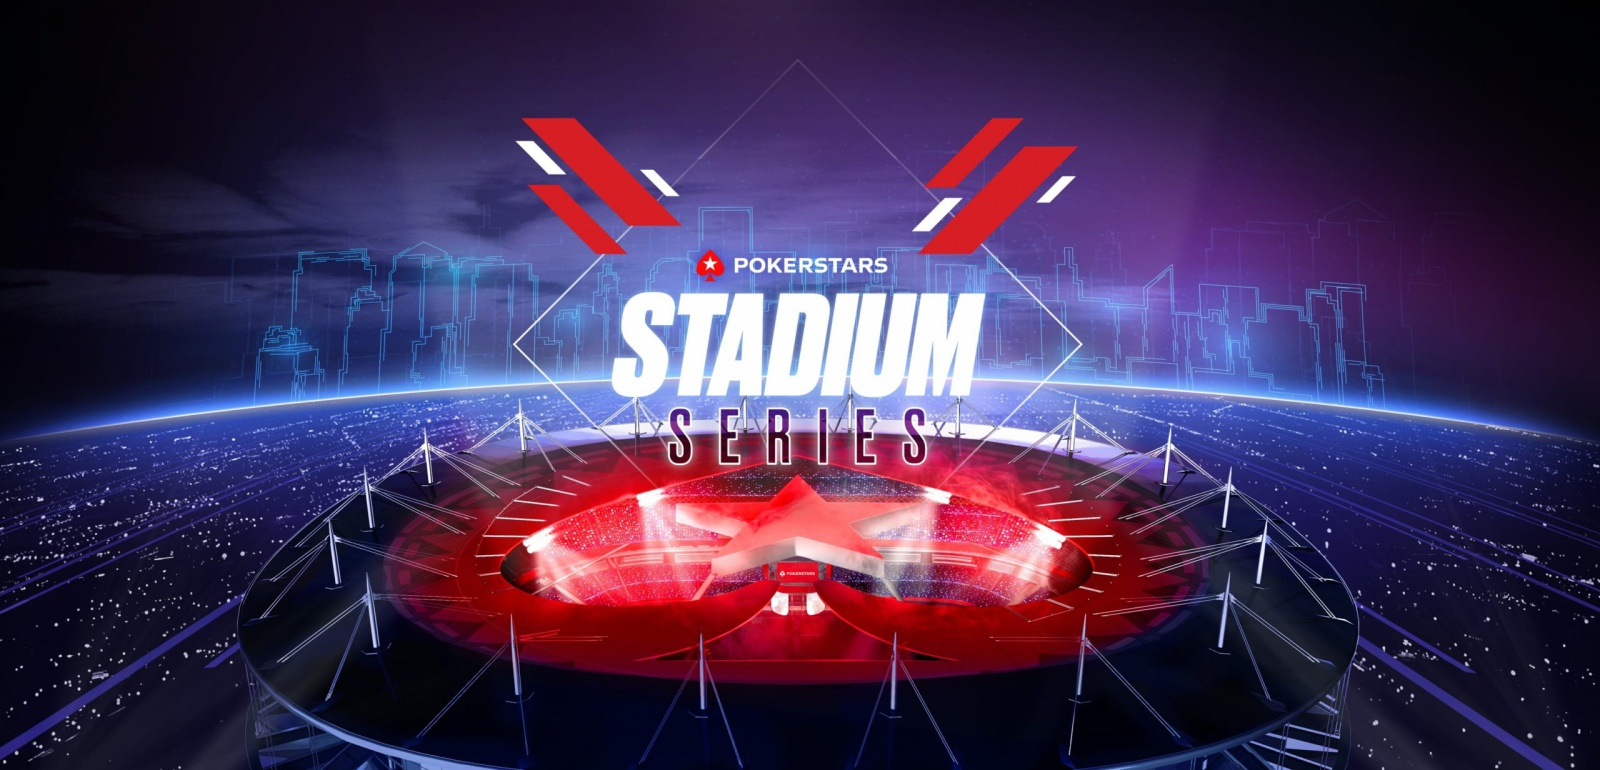 stadium_series-1-scaled.thumb.jpg.4fd78cde1d3ac16675938fa8350156ea.jpg